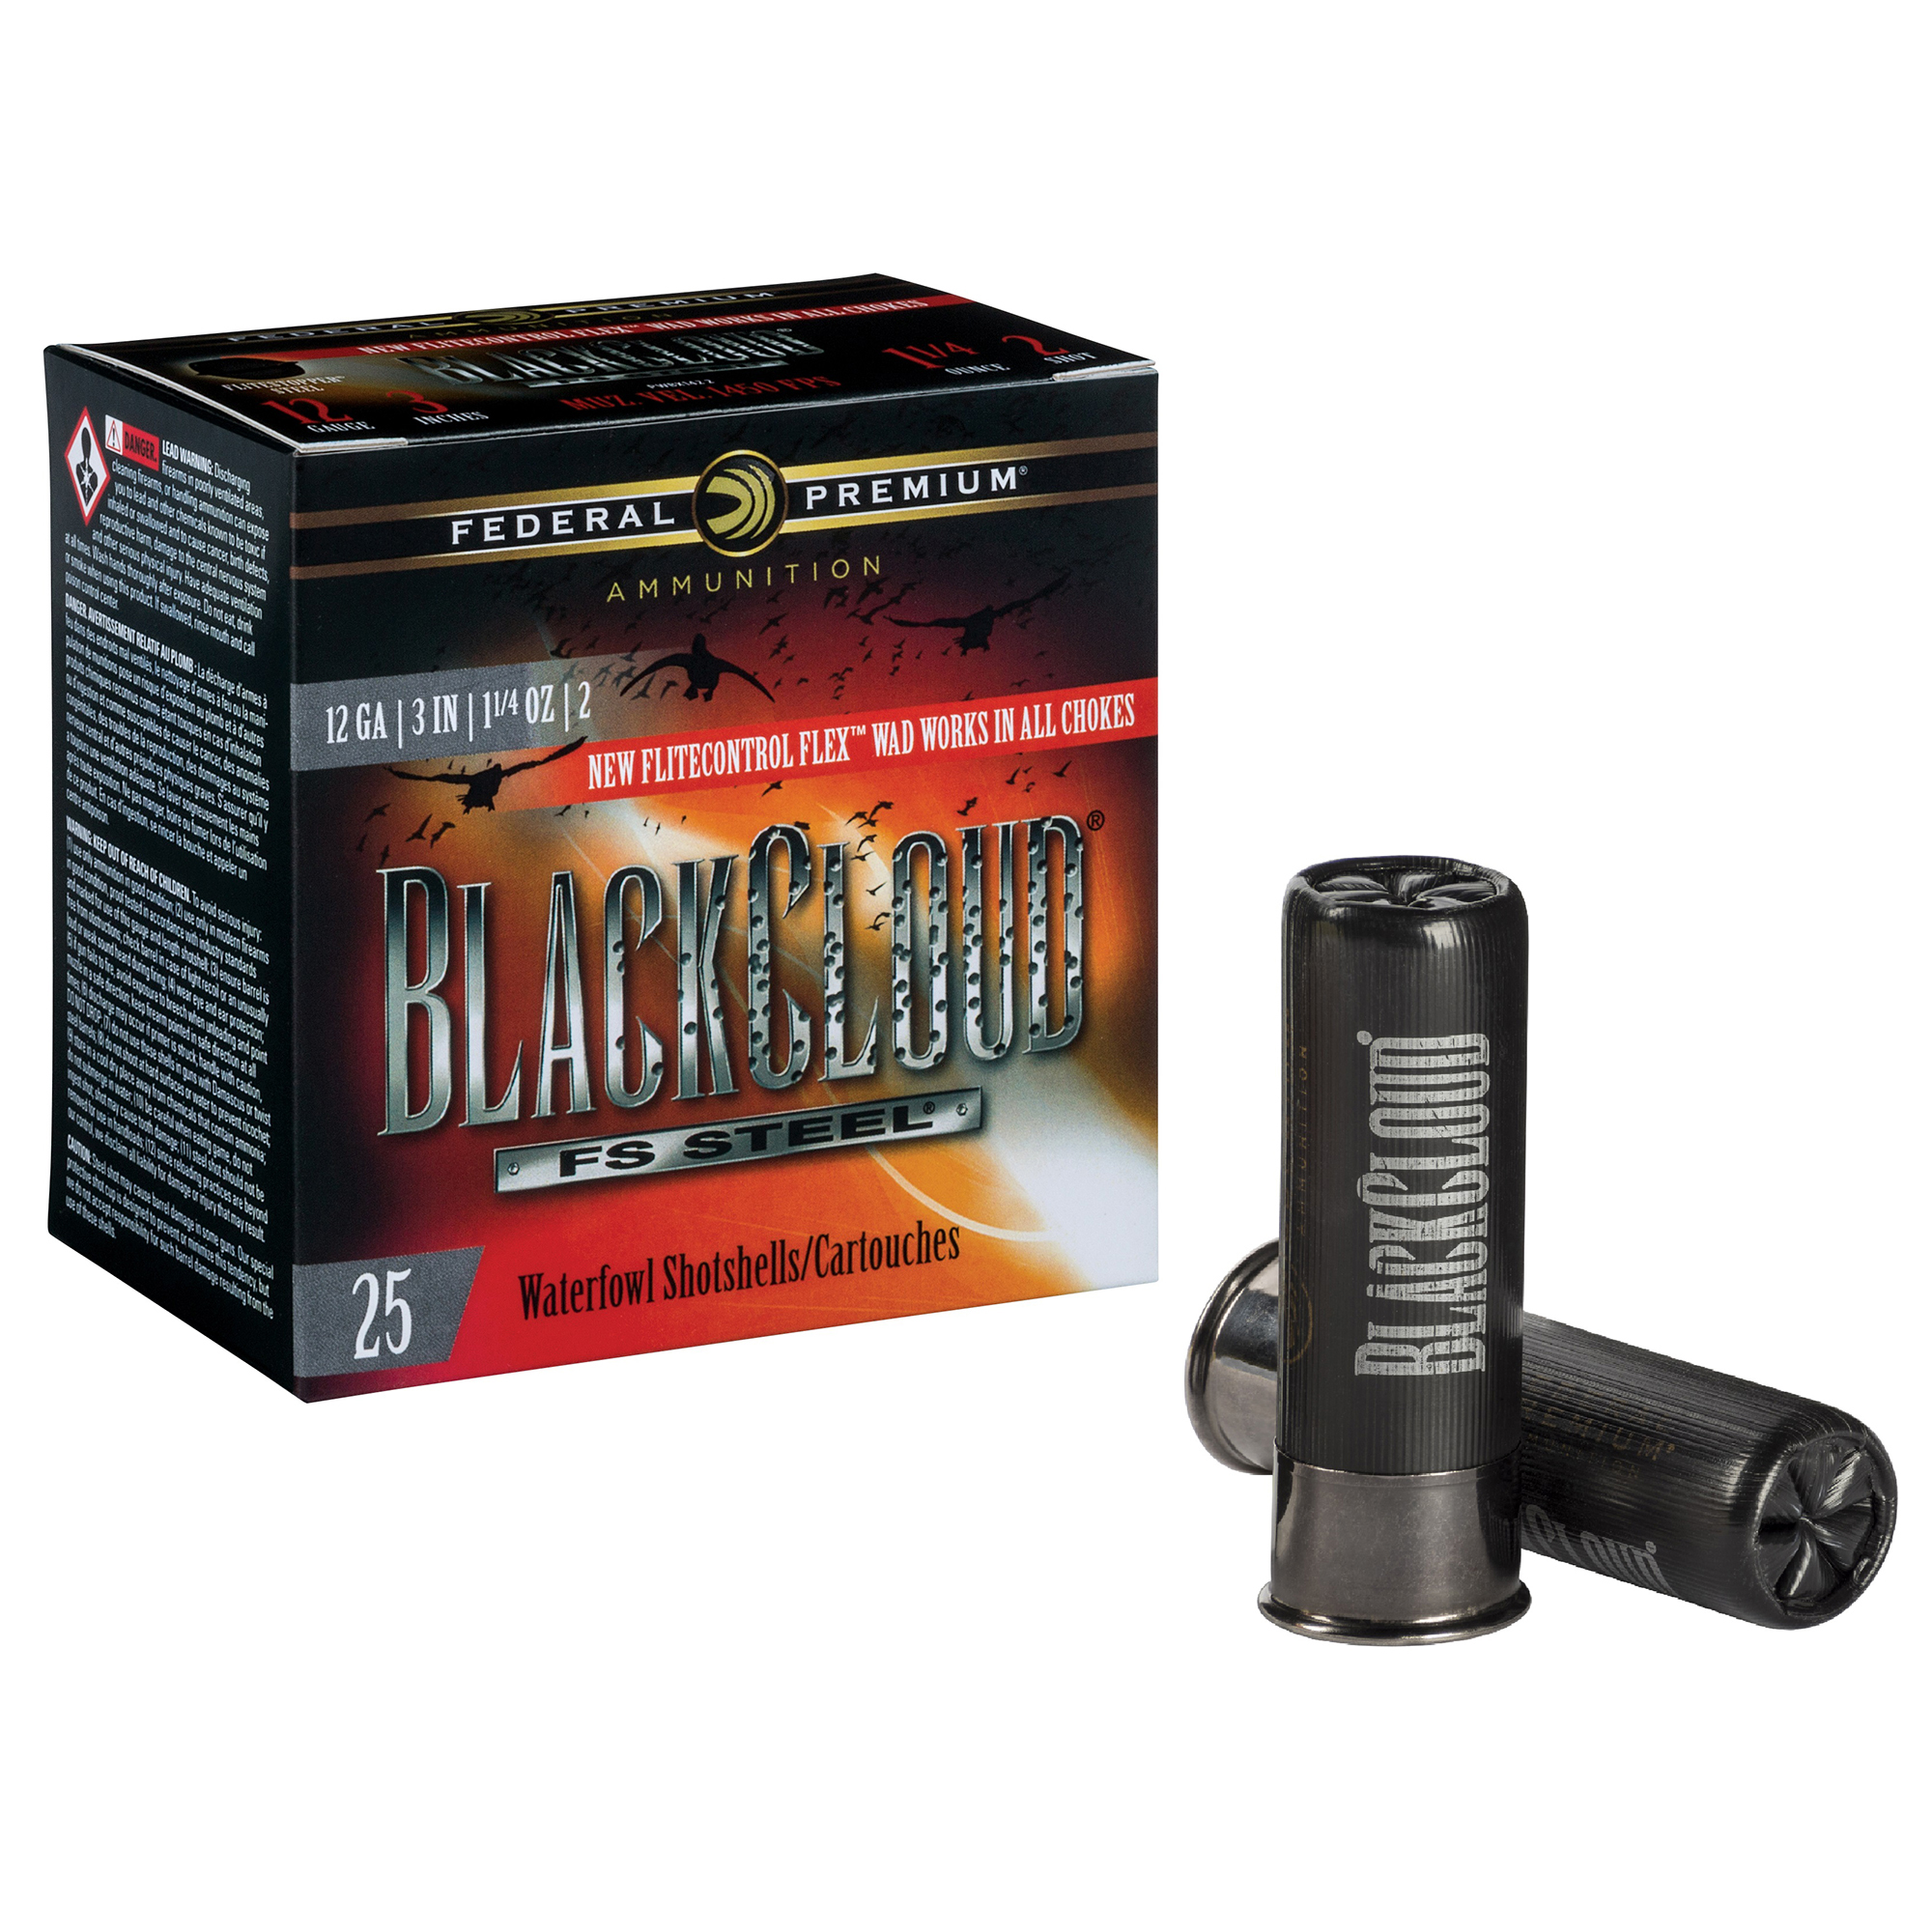 Federal Premium Black Cloud FS Steel Shotshells